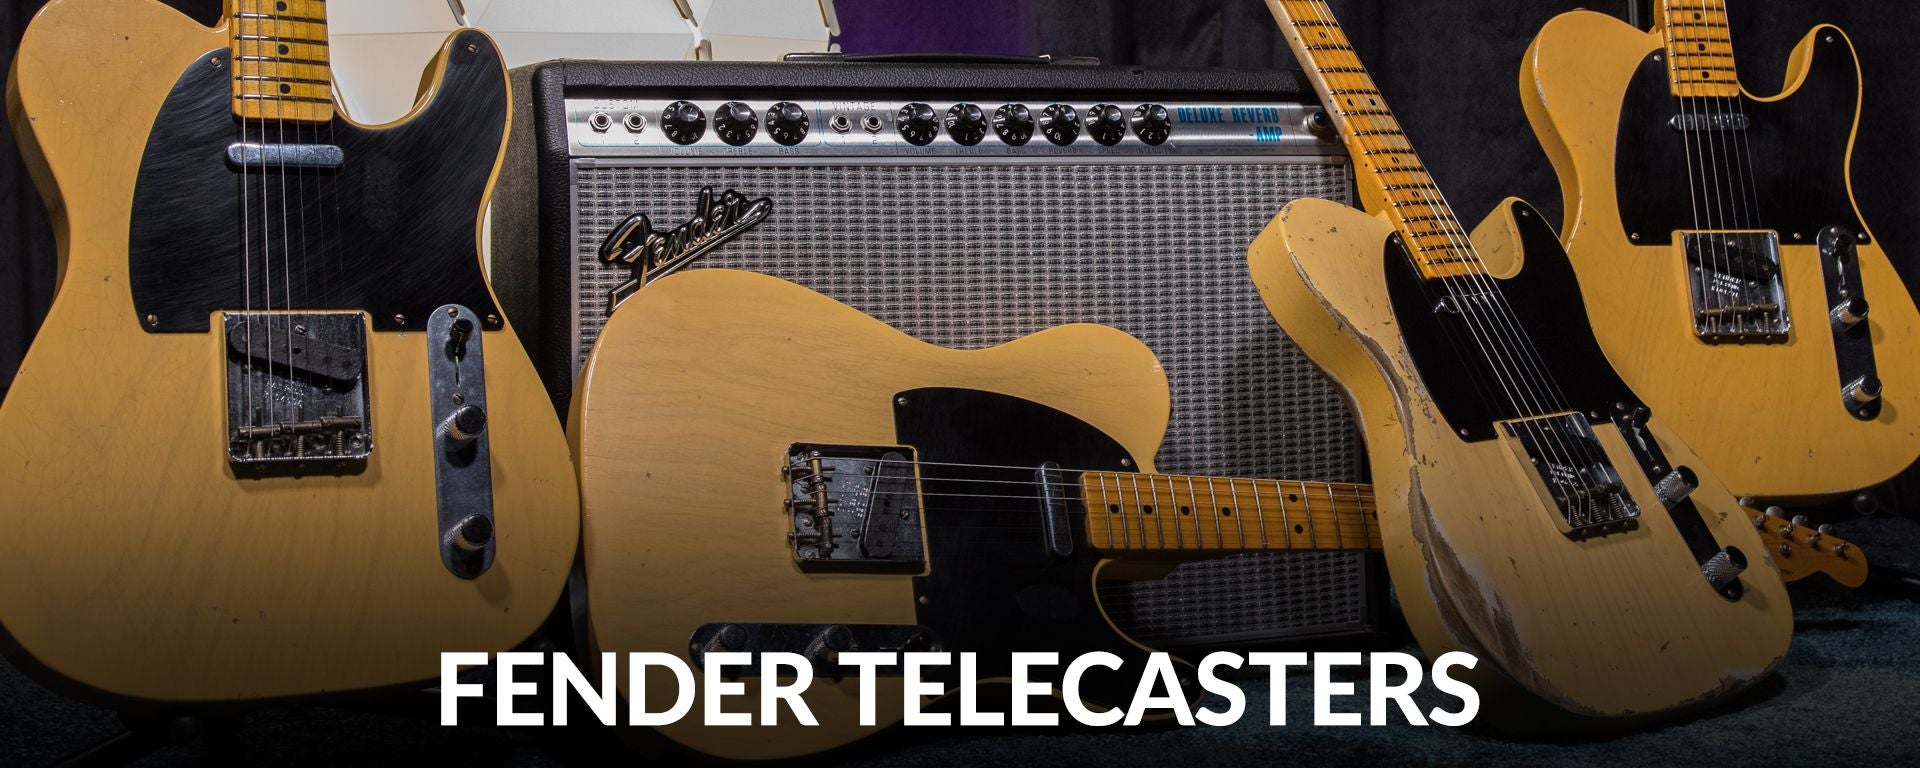 Fender Telecasters at Sam Ash